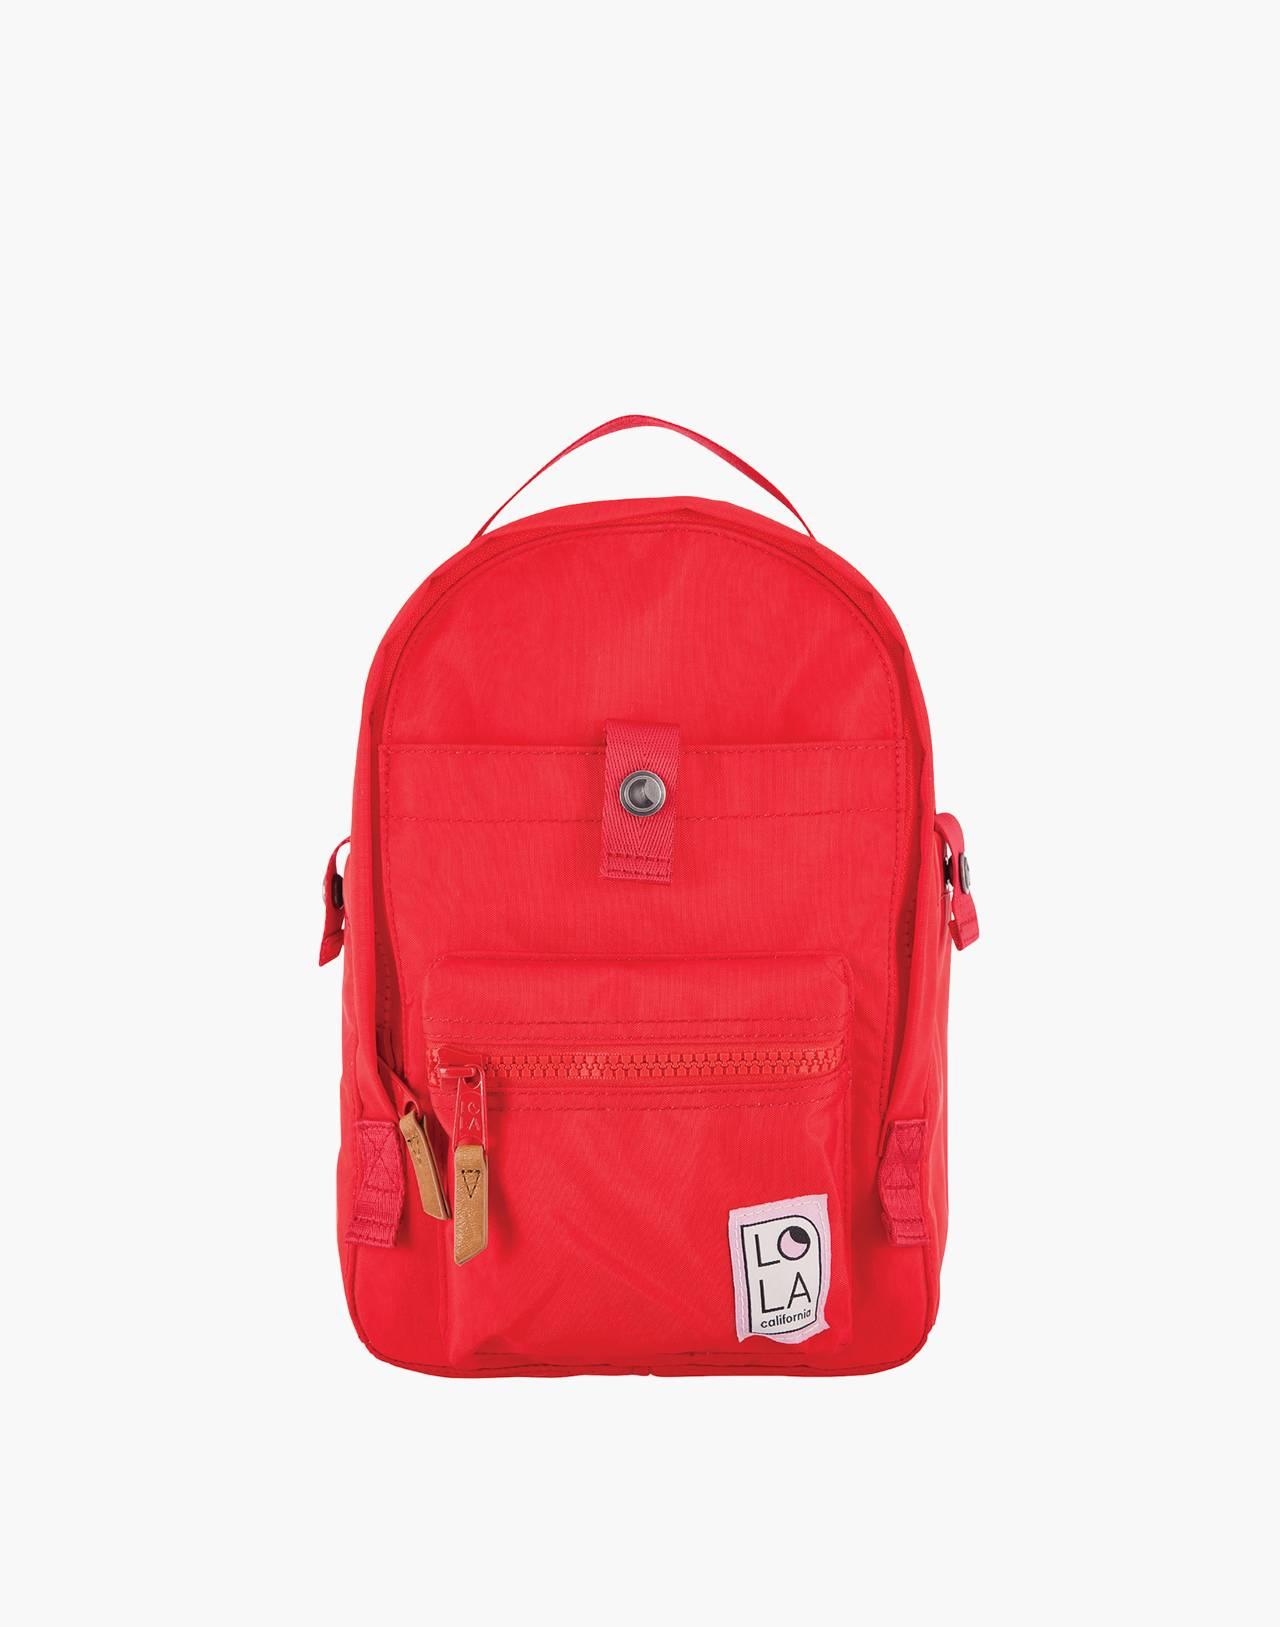 LOLA™ Mondo Utopian Small Backpack in red image 1